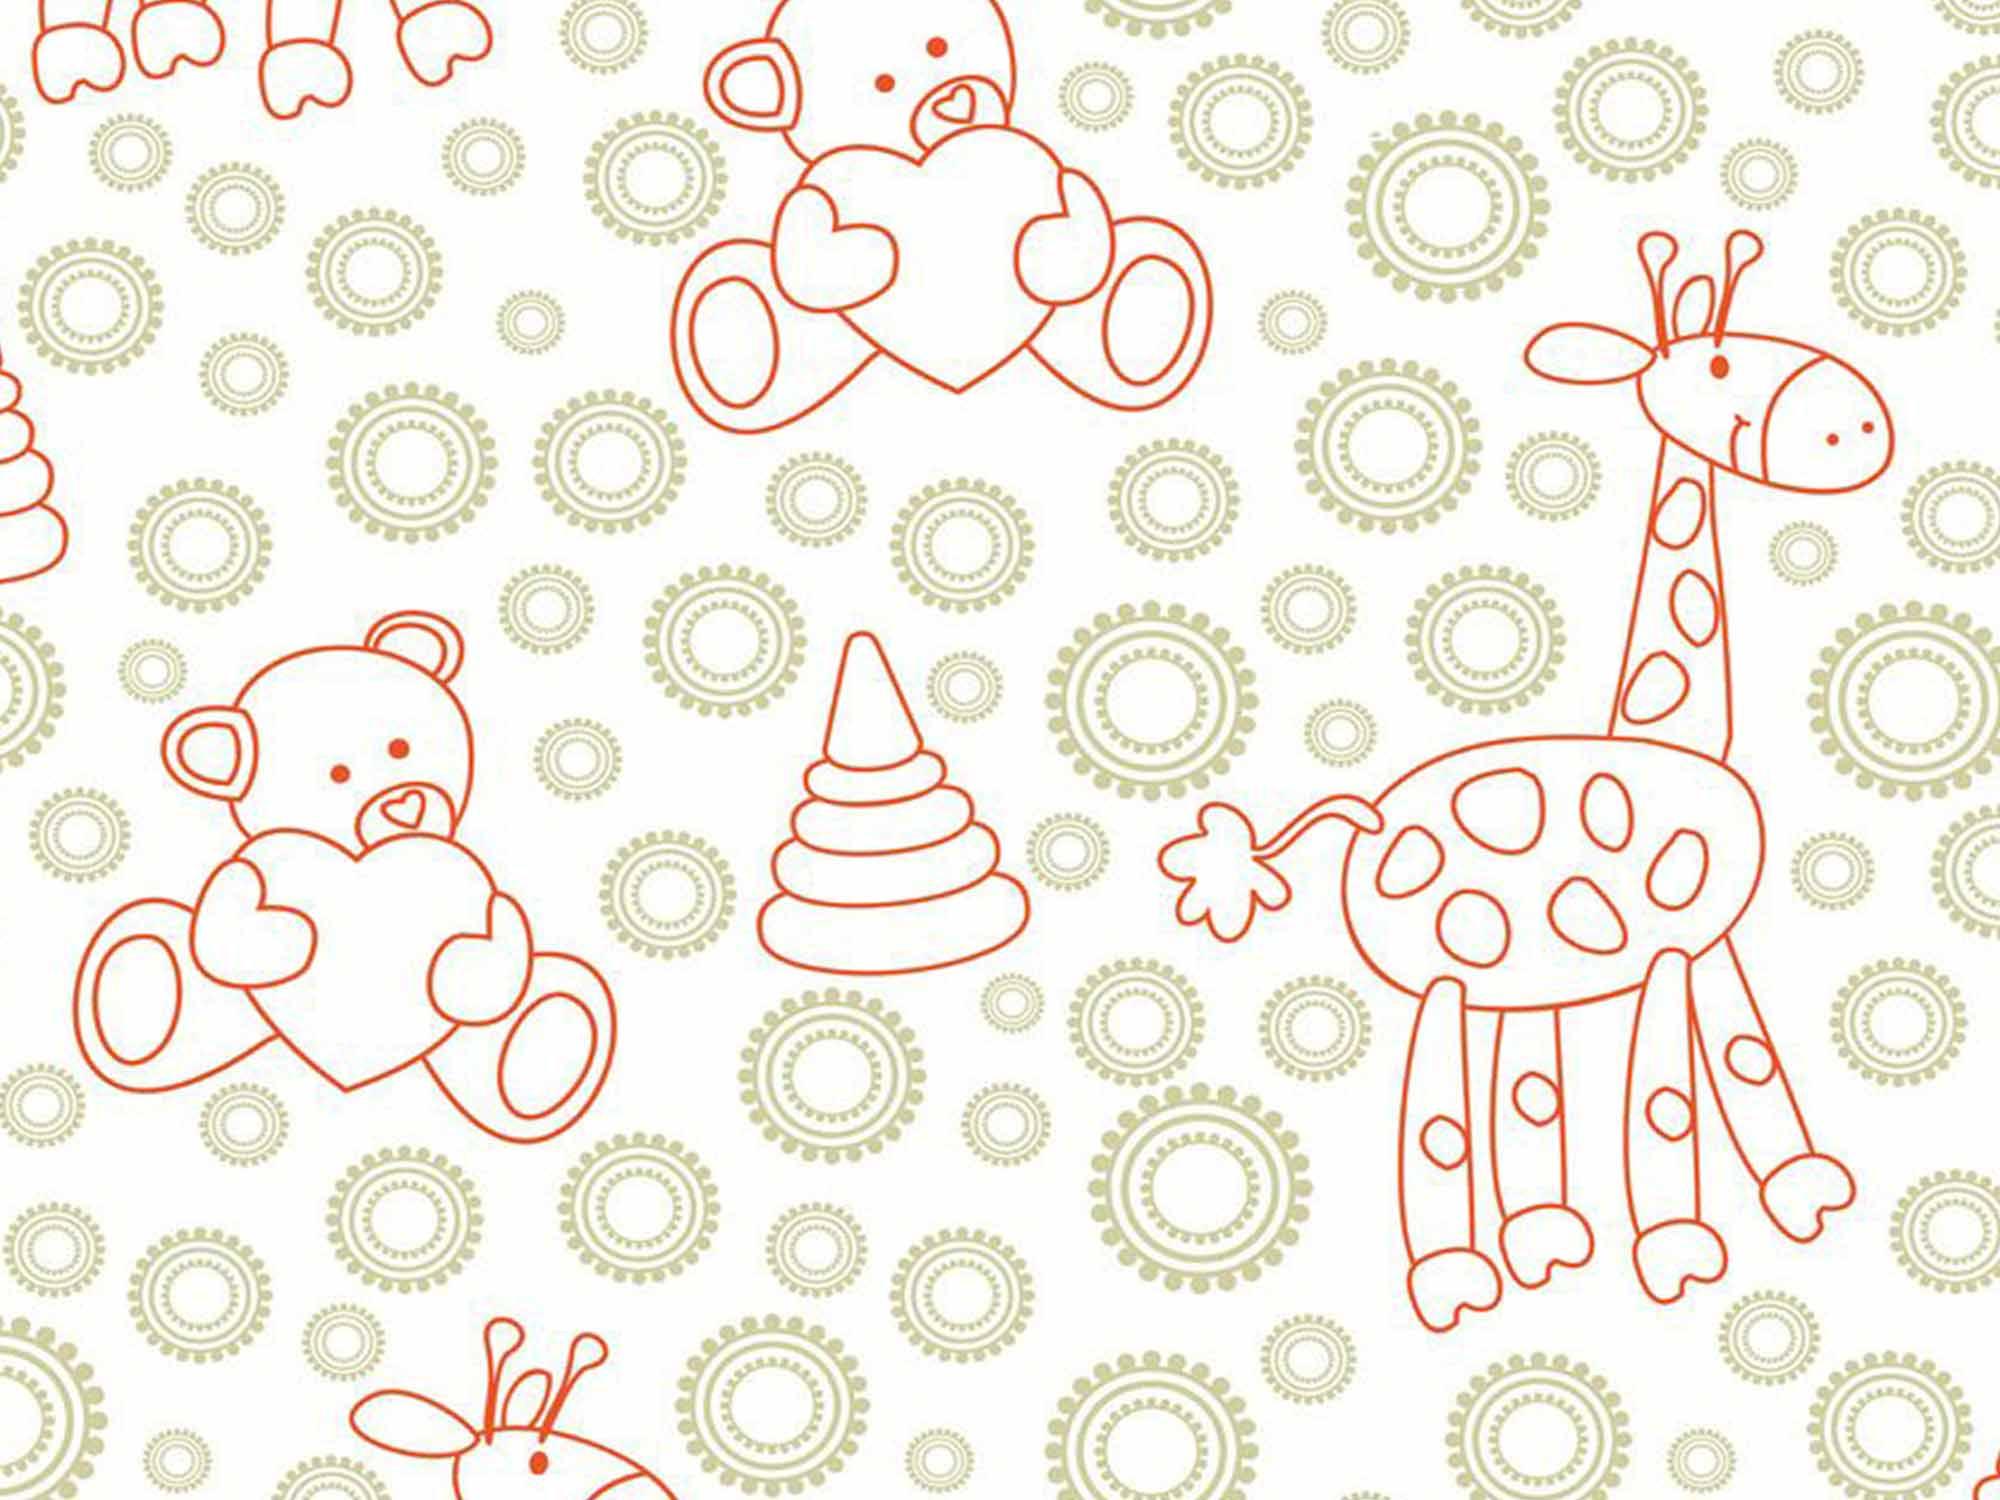 Papel de Parede Infantil 0032 - Adesivos de Parede  - Paredes Decoradas